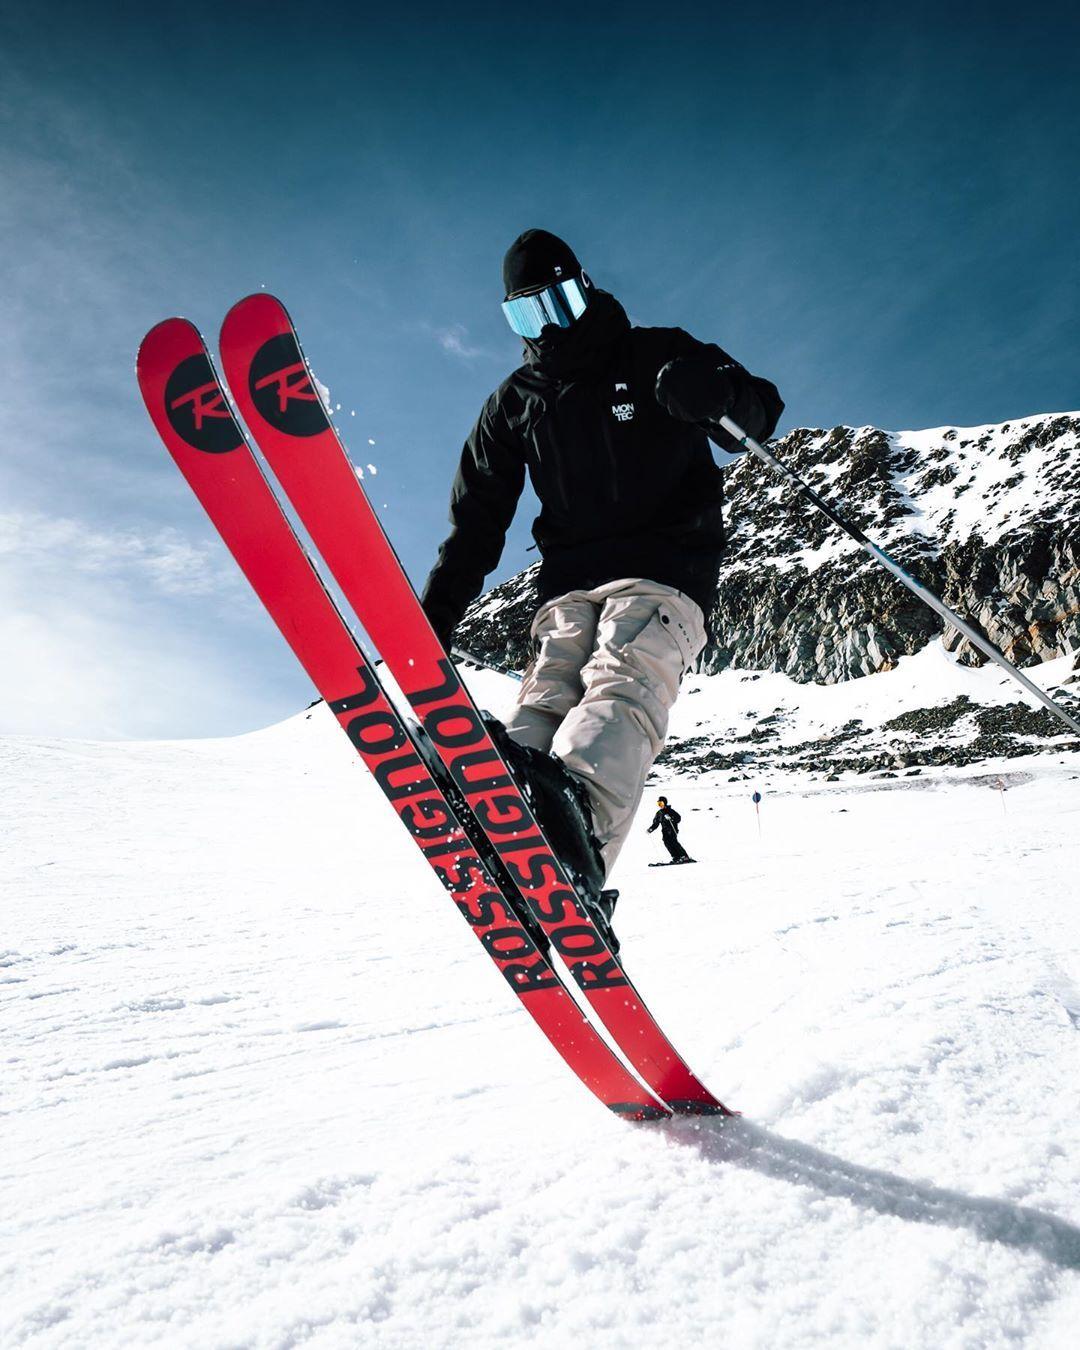 Fawk Ski Jacket Black in 2020 | Ski jacket, Skiing outfit